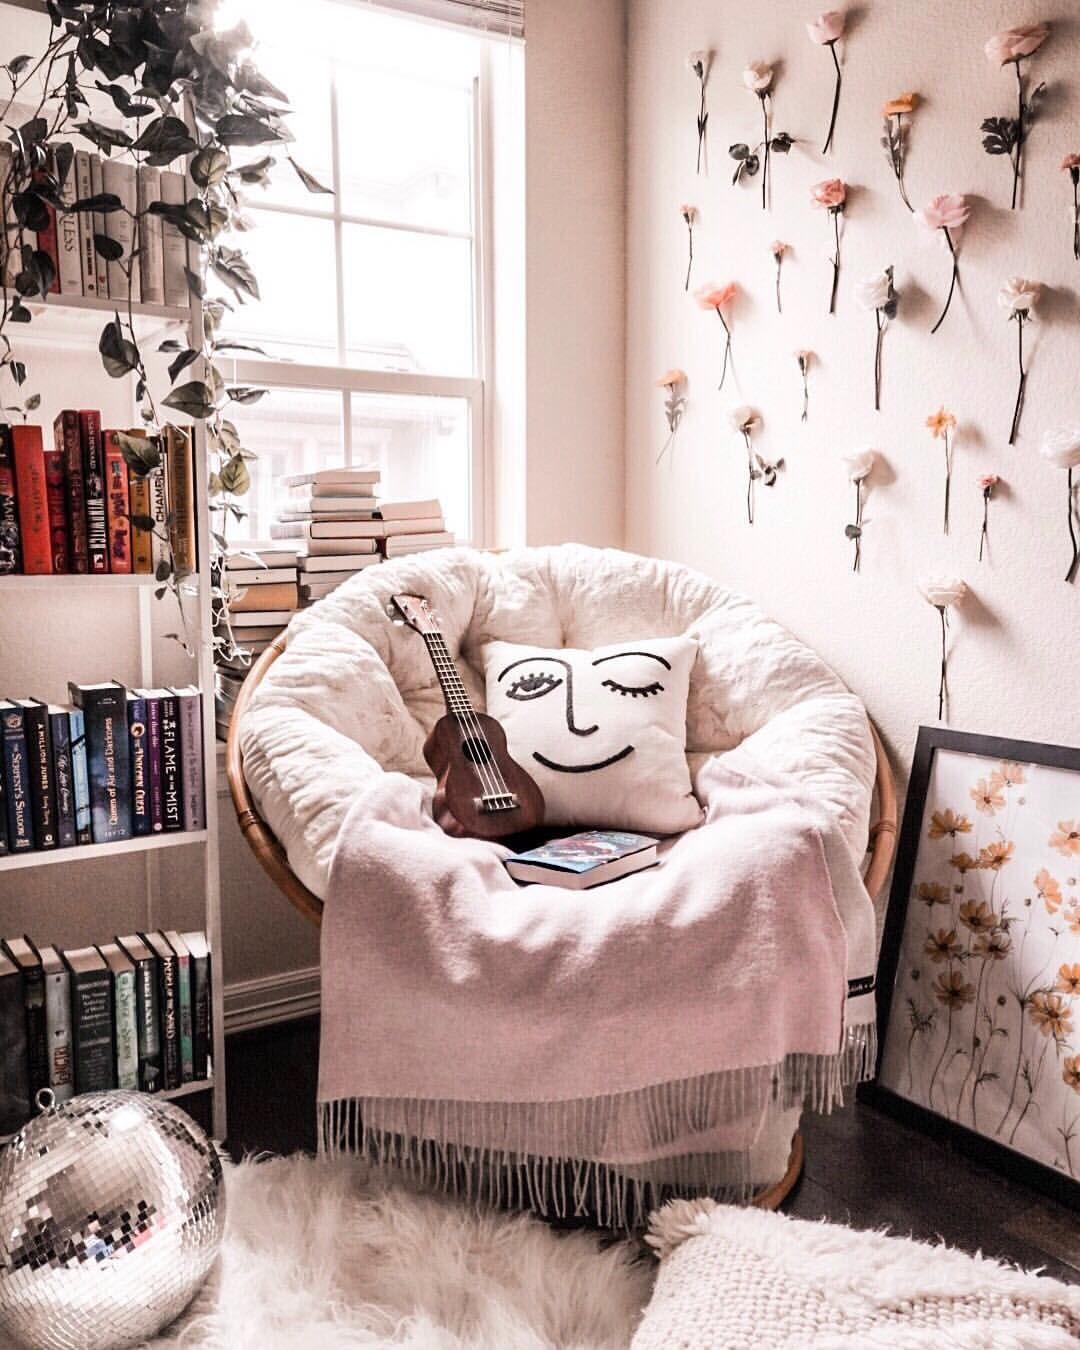 Cozy Reading Nook Ideas Astoldbymichelle Readingcorner Bookshelf Shelfie Shelfstyling Myhom Bedroom Reading Nooks Aesthetic Room Decor Aesthetic Bedroom